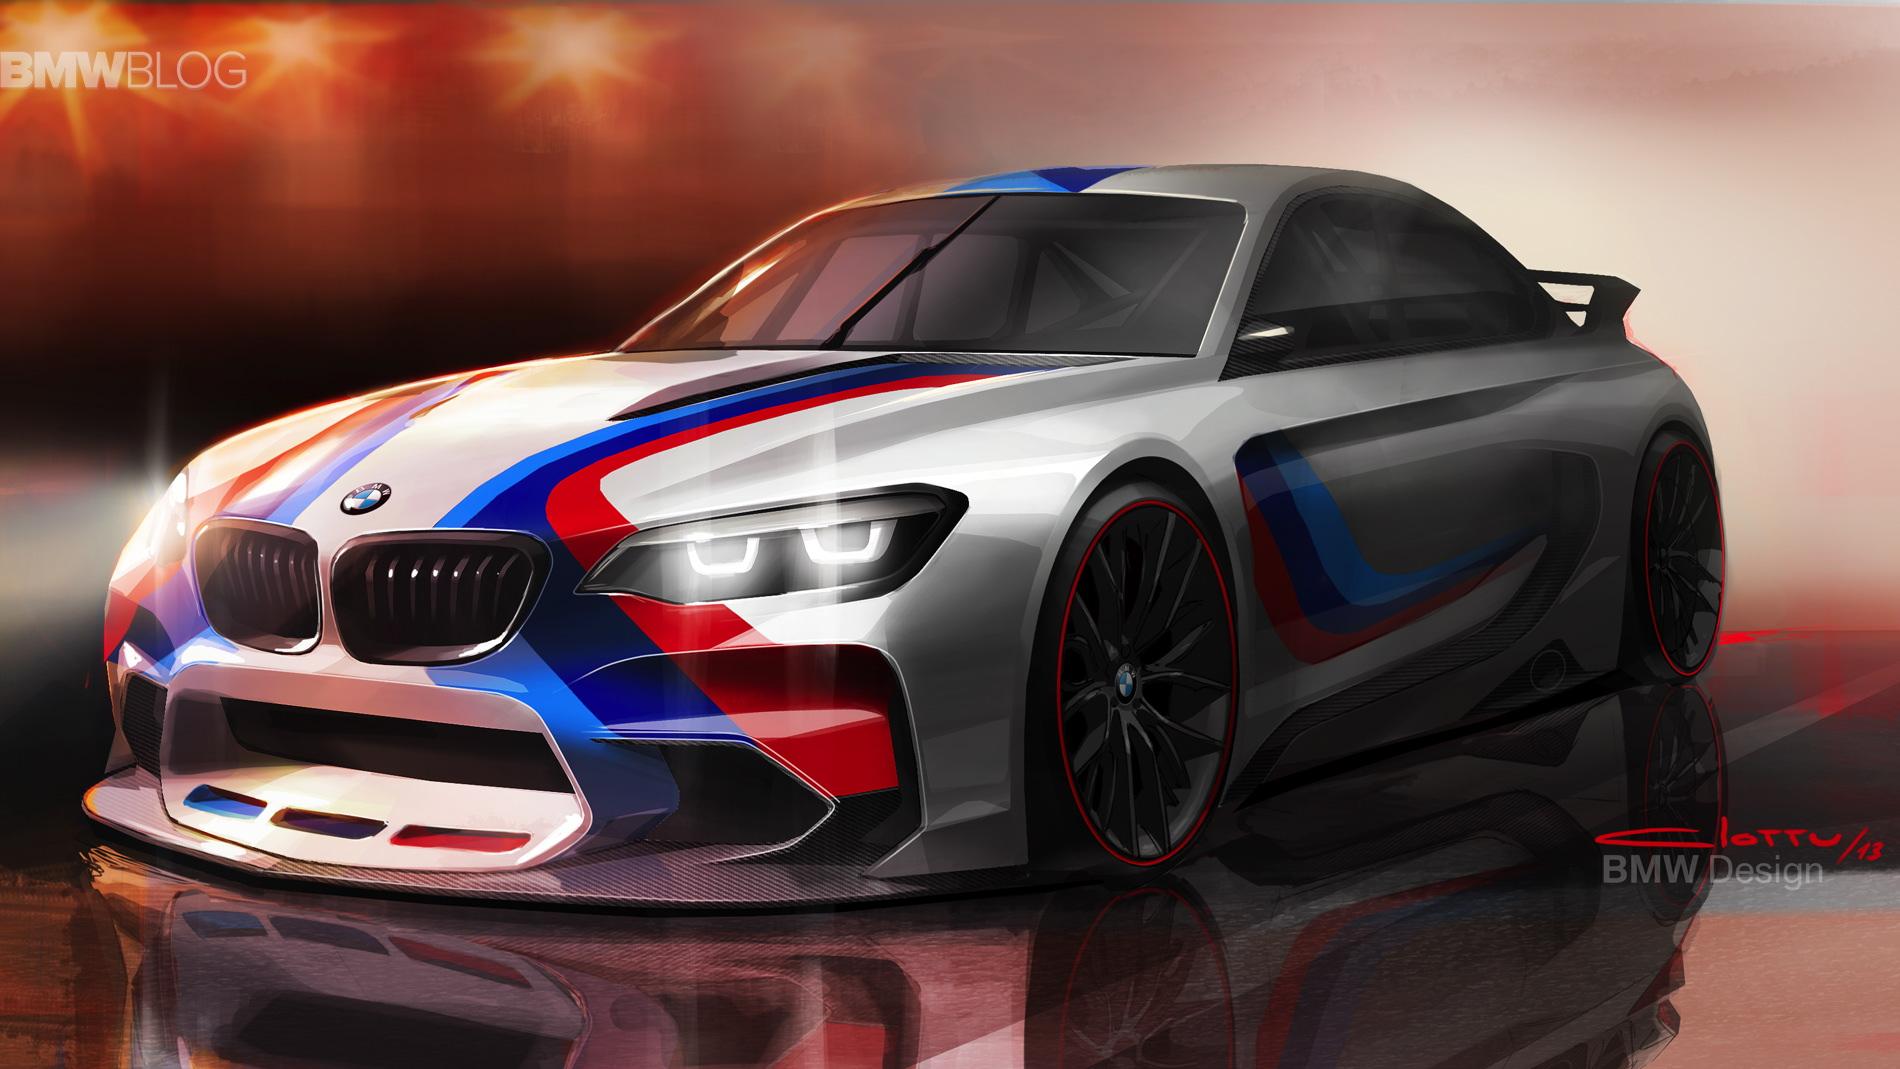 The Bmw Vision Gran Turismo Virtual Race Car